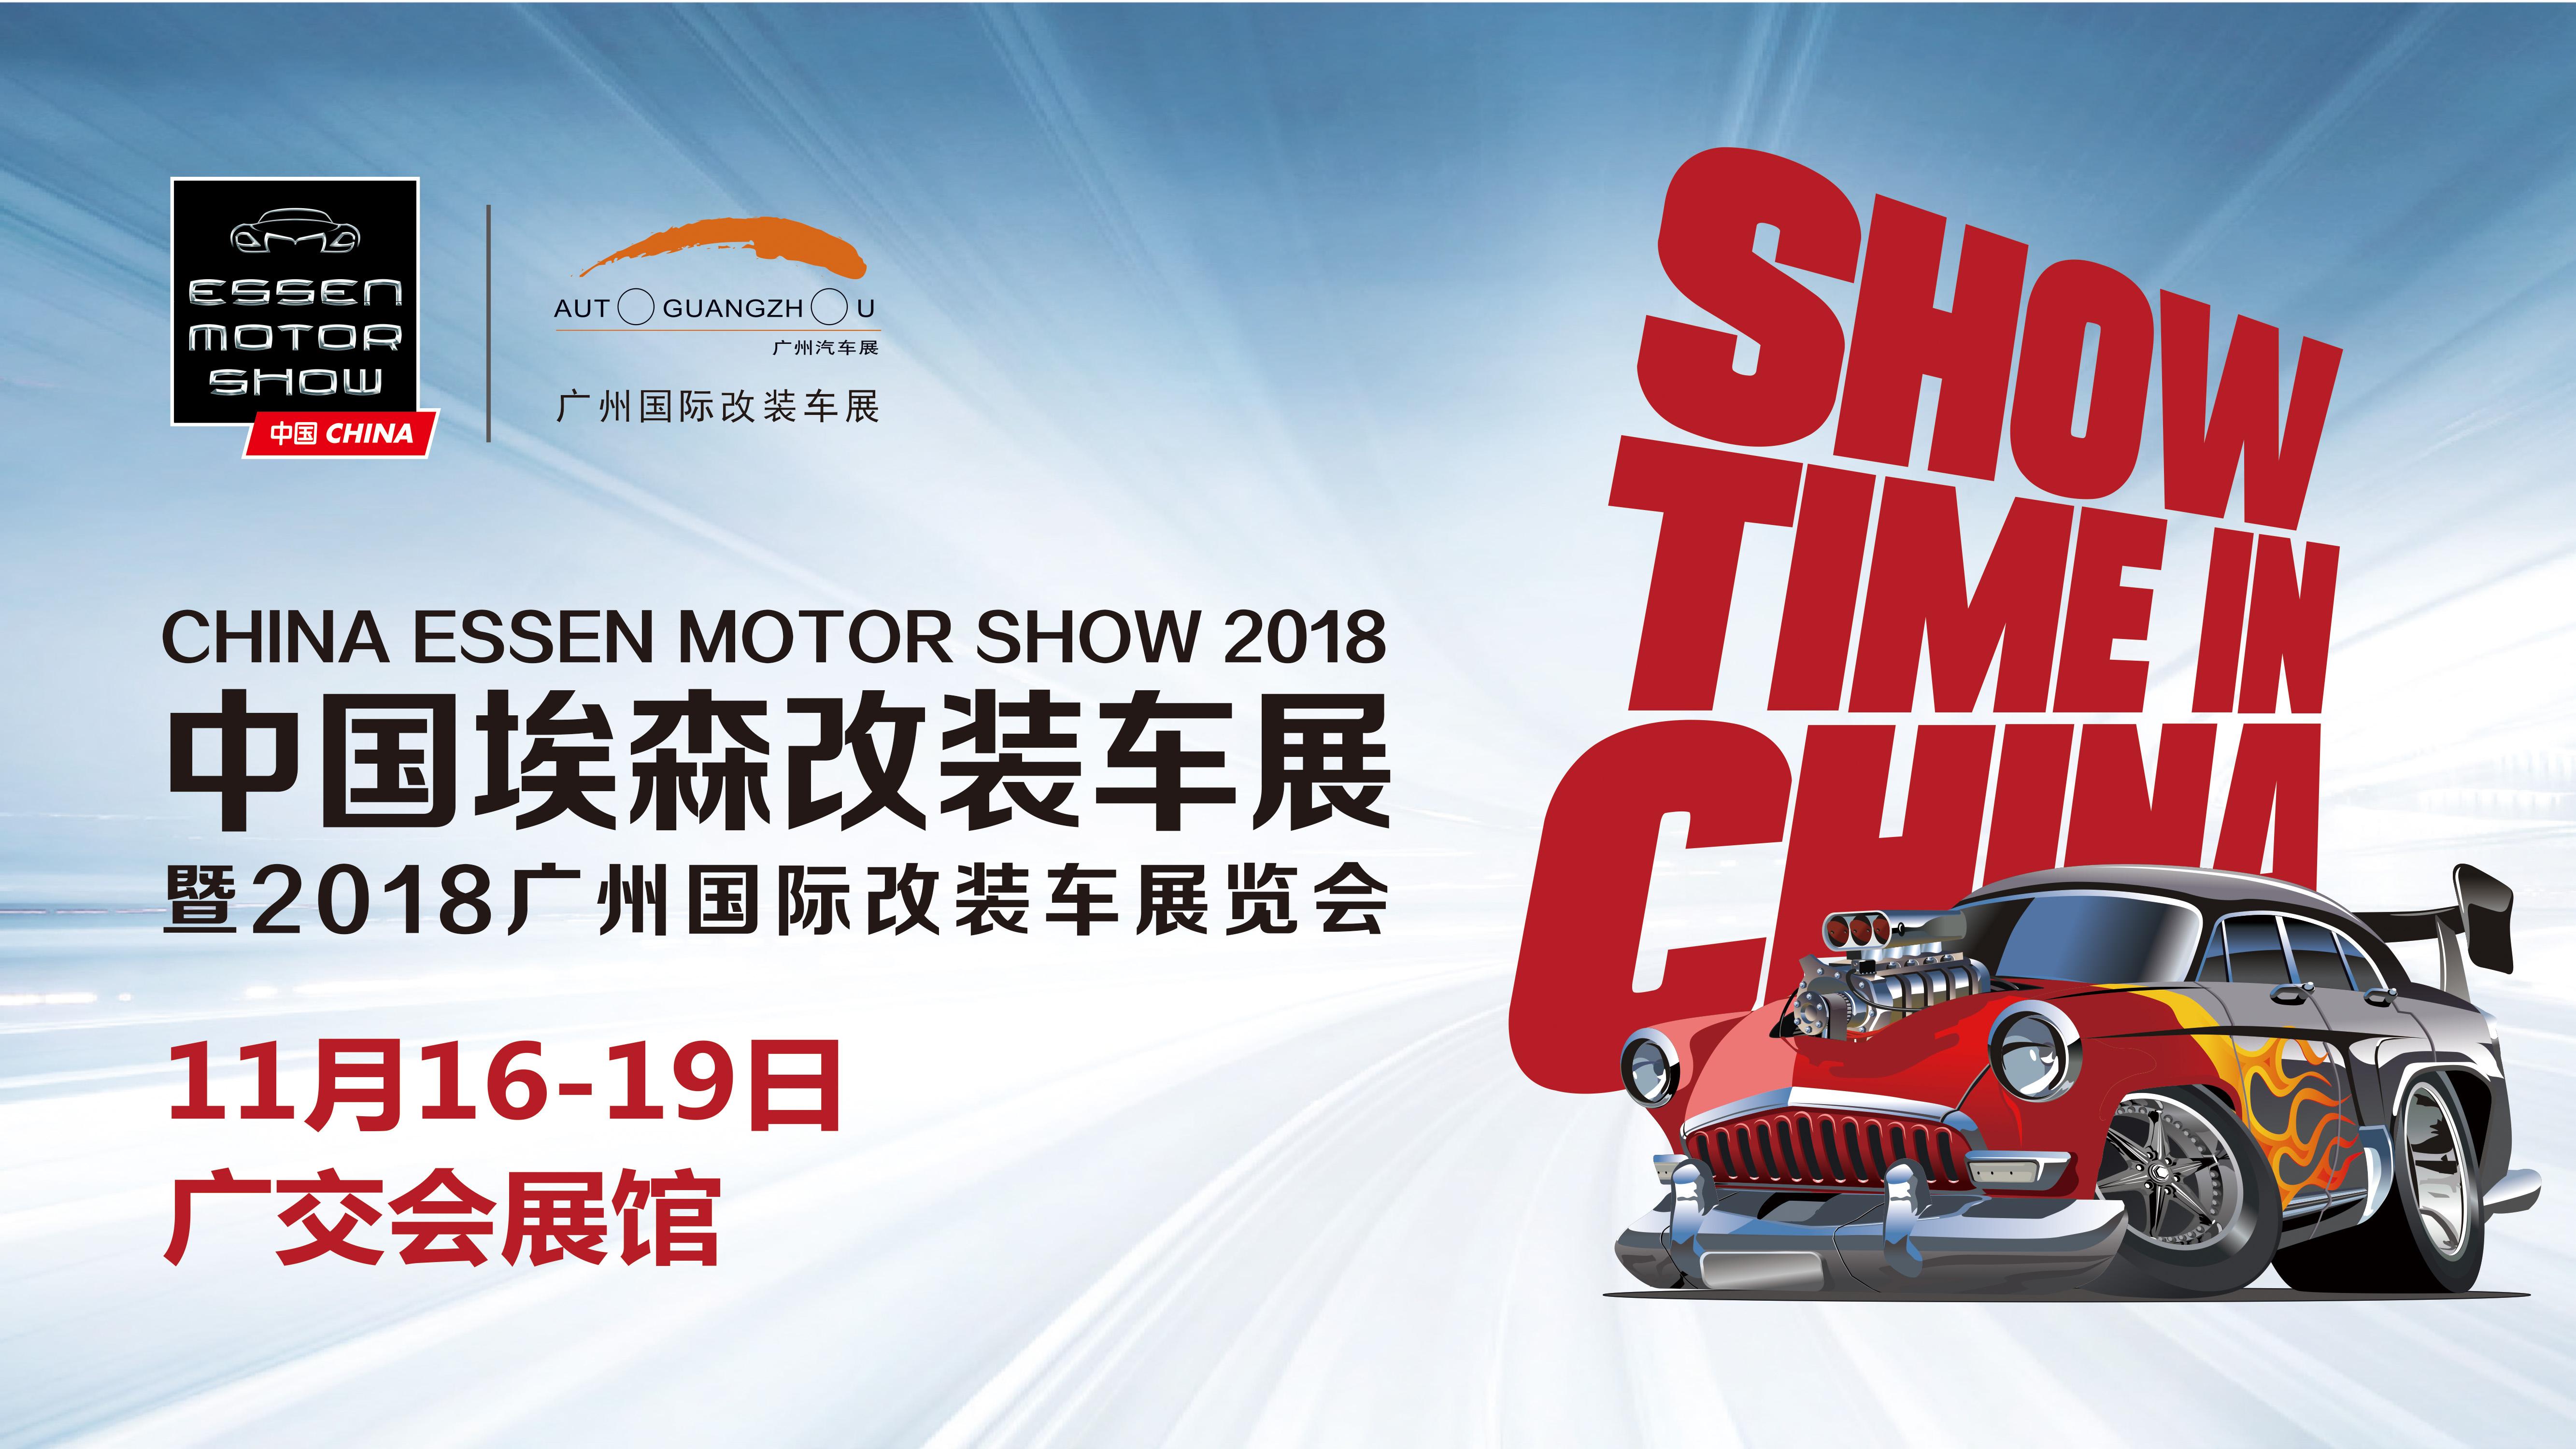 CEMS 2018广州国际改装车展 新闻推介会在佛山举办